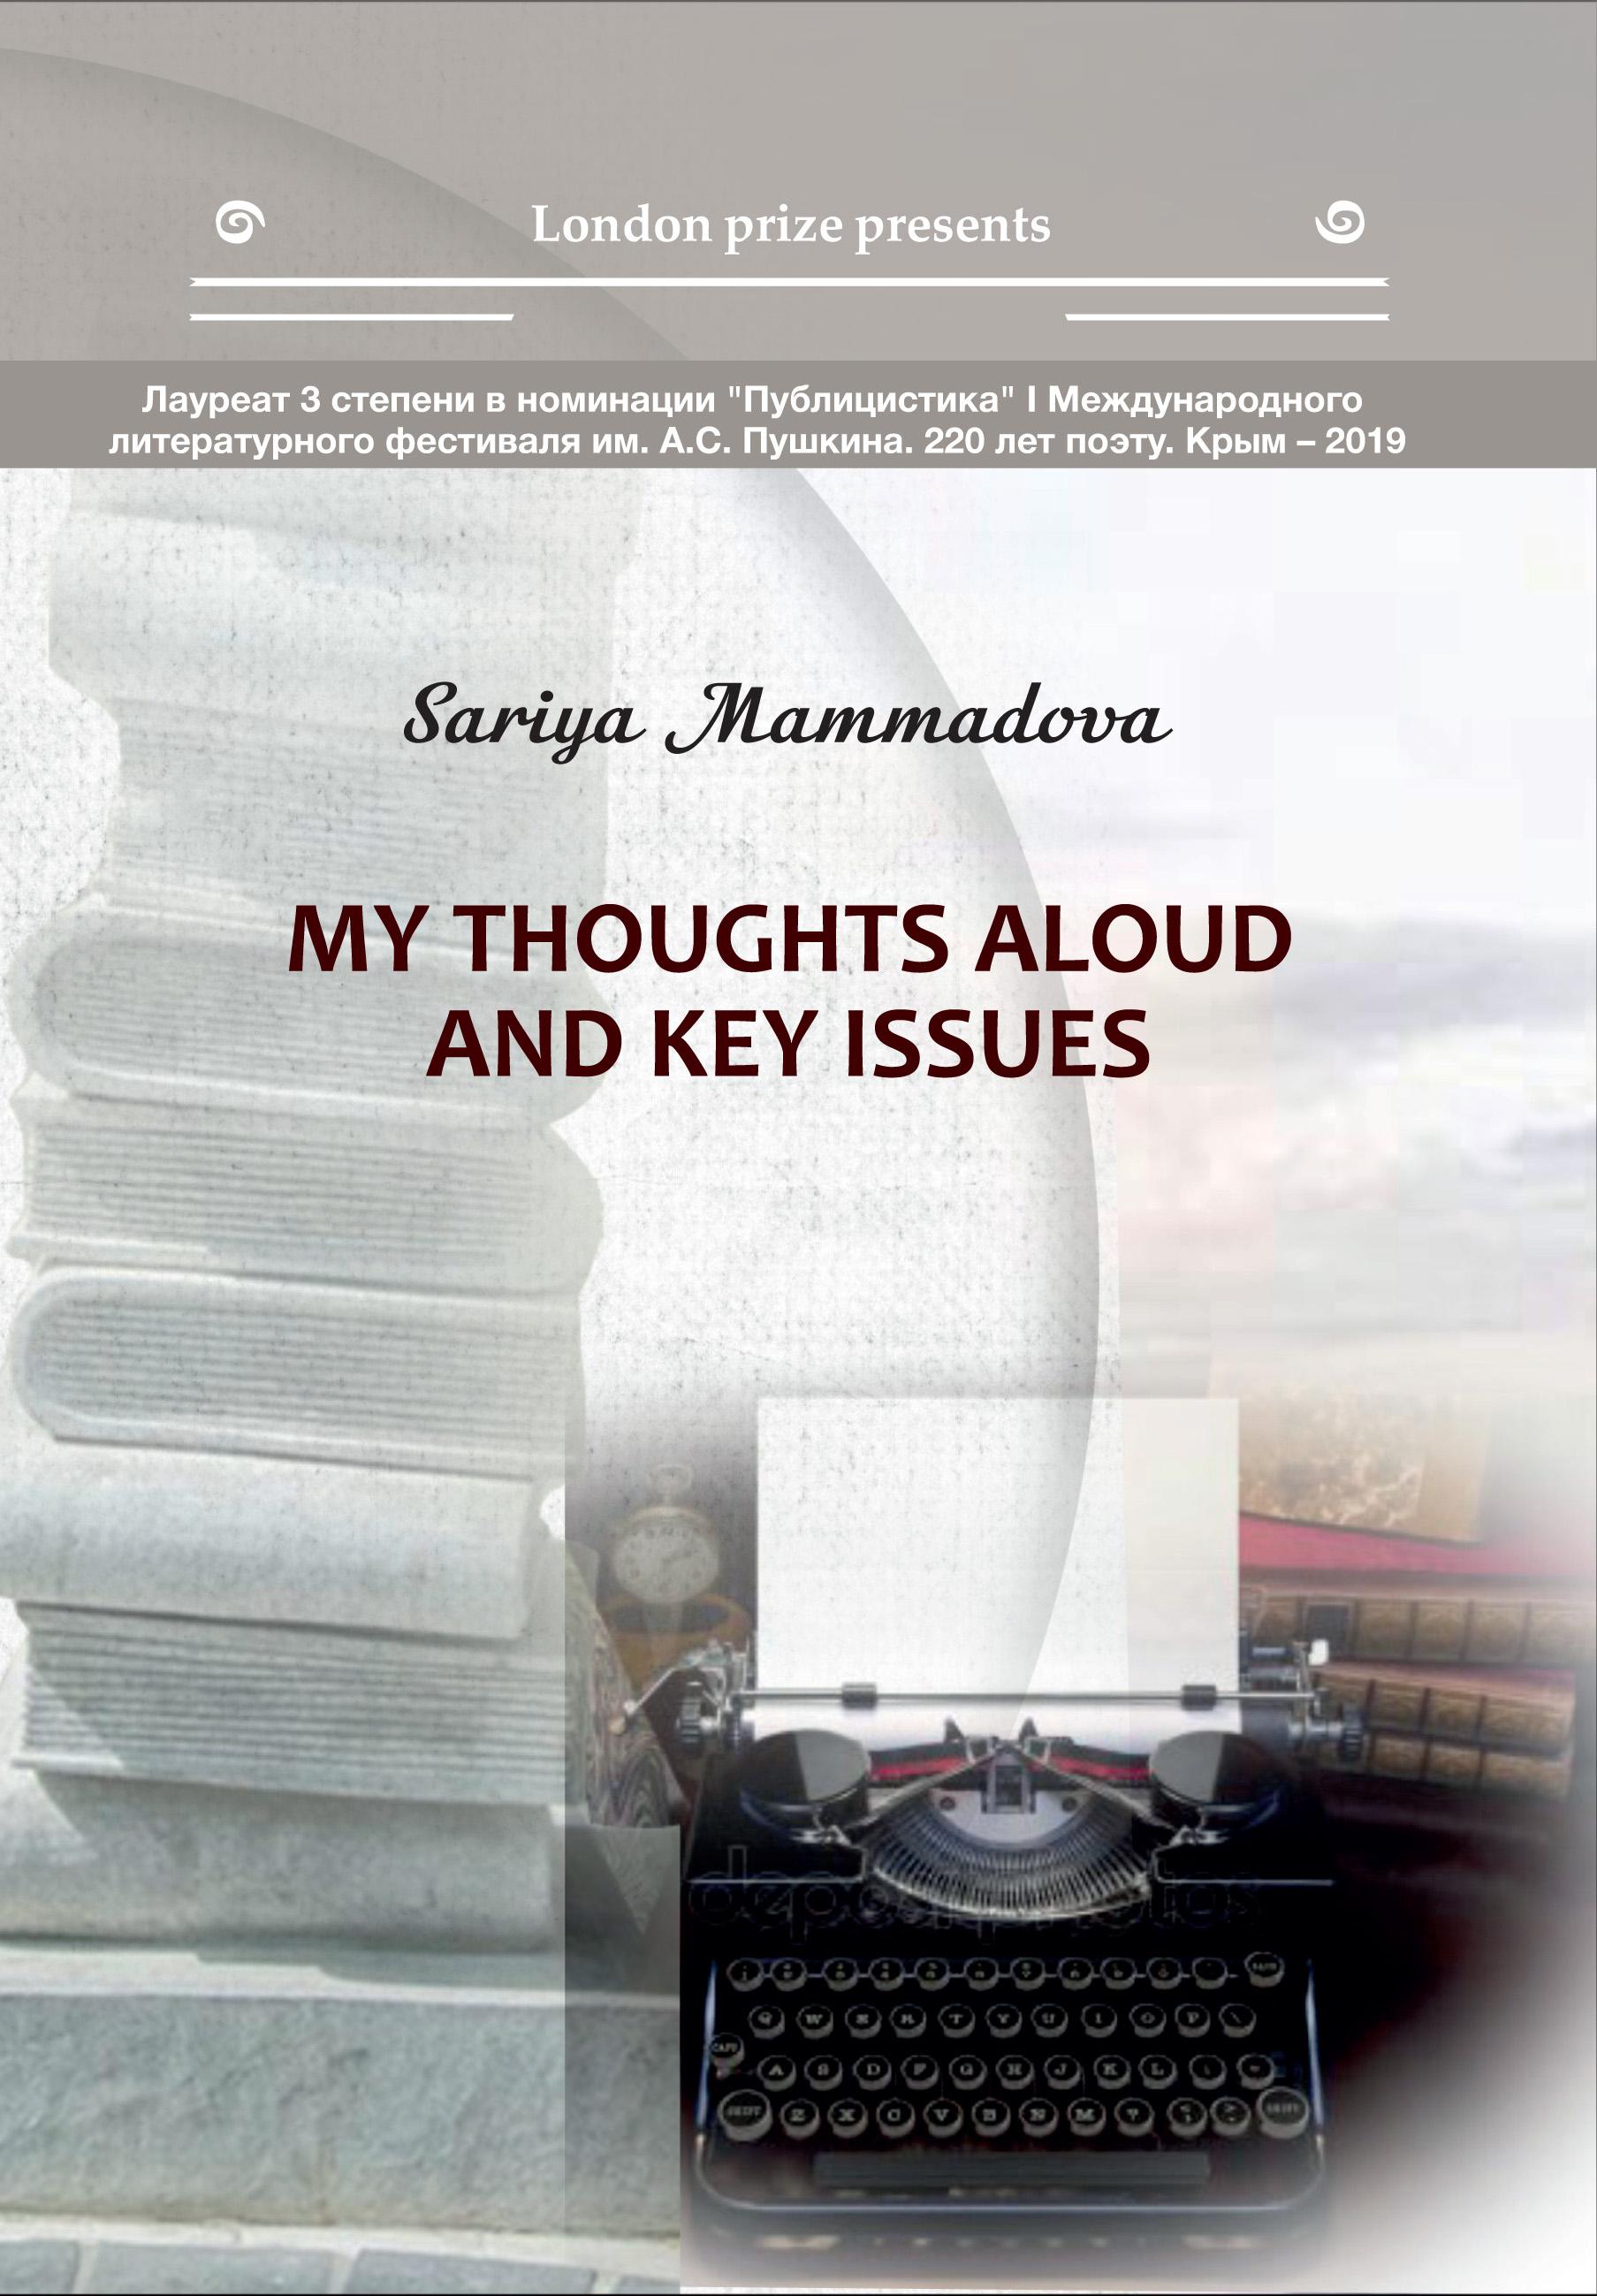 My Thoughts aloud and key Issues / Краткие мысли вслух и высказывания автора